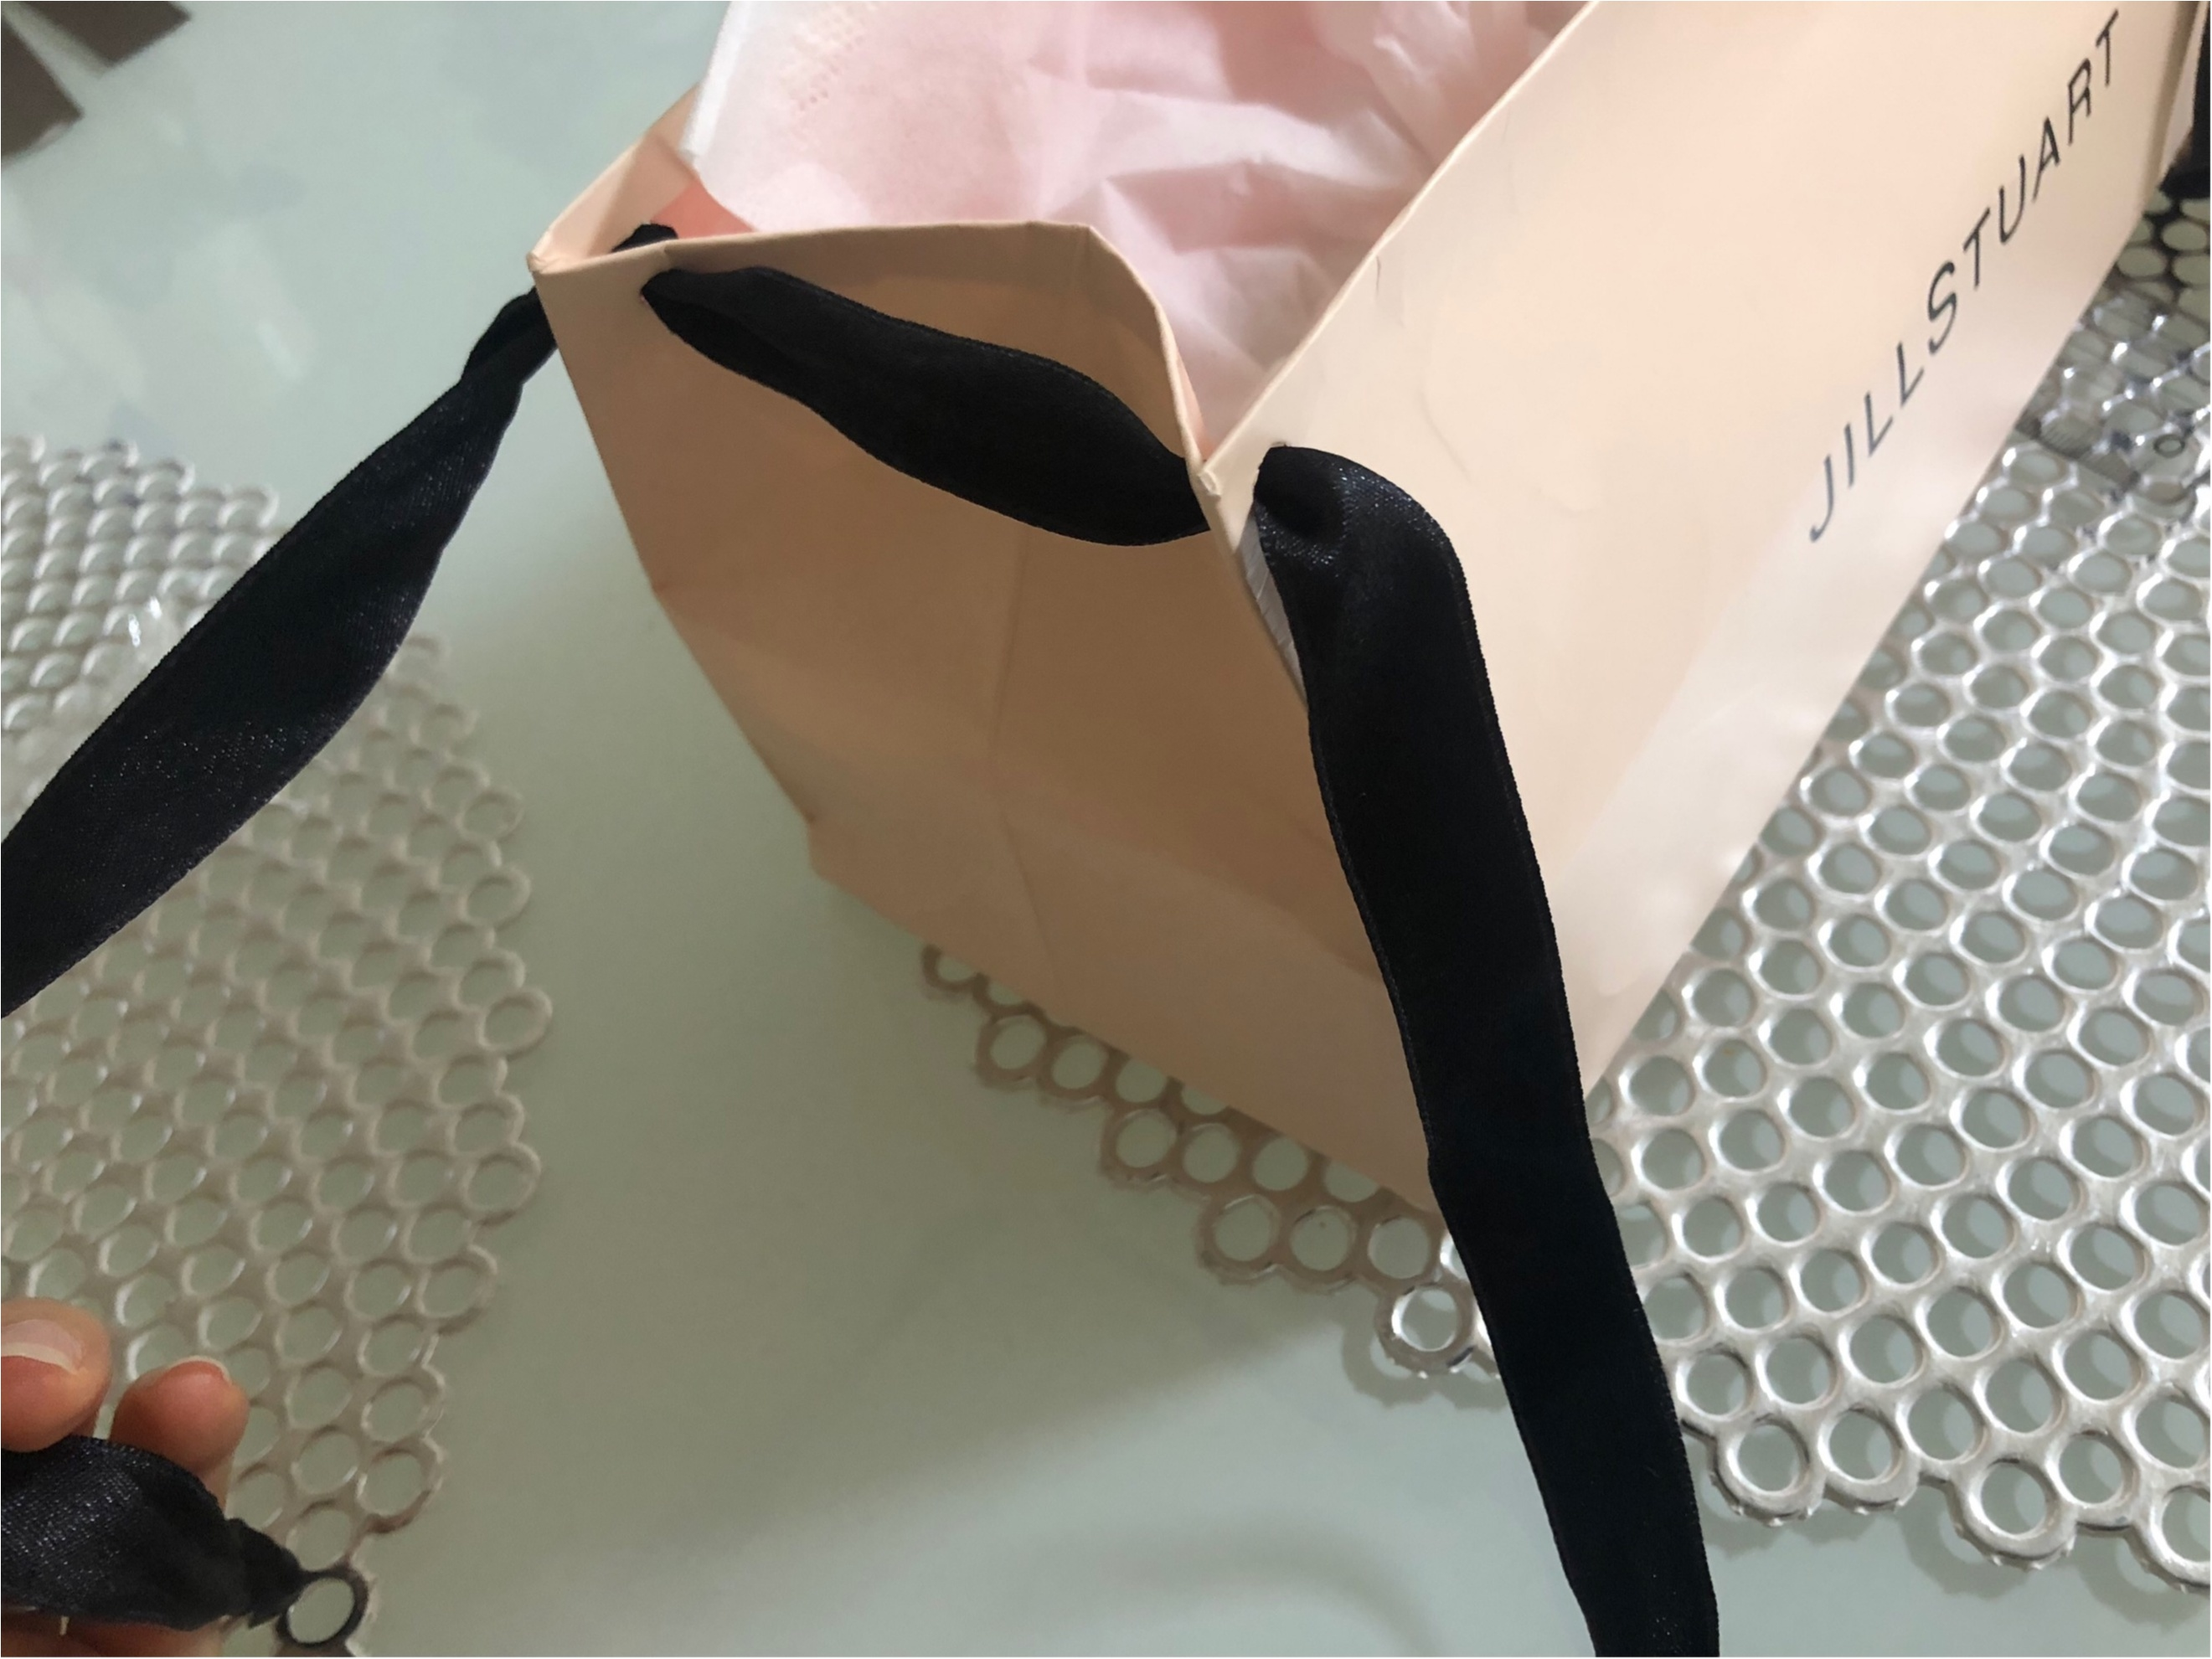 【DIY】とっても可愛いティッシュボックスが0円で作れる??♡作り方はとっても簡単です!!_9